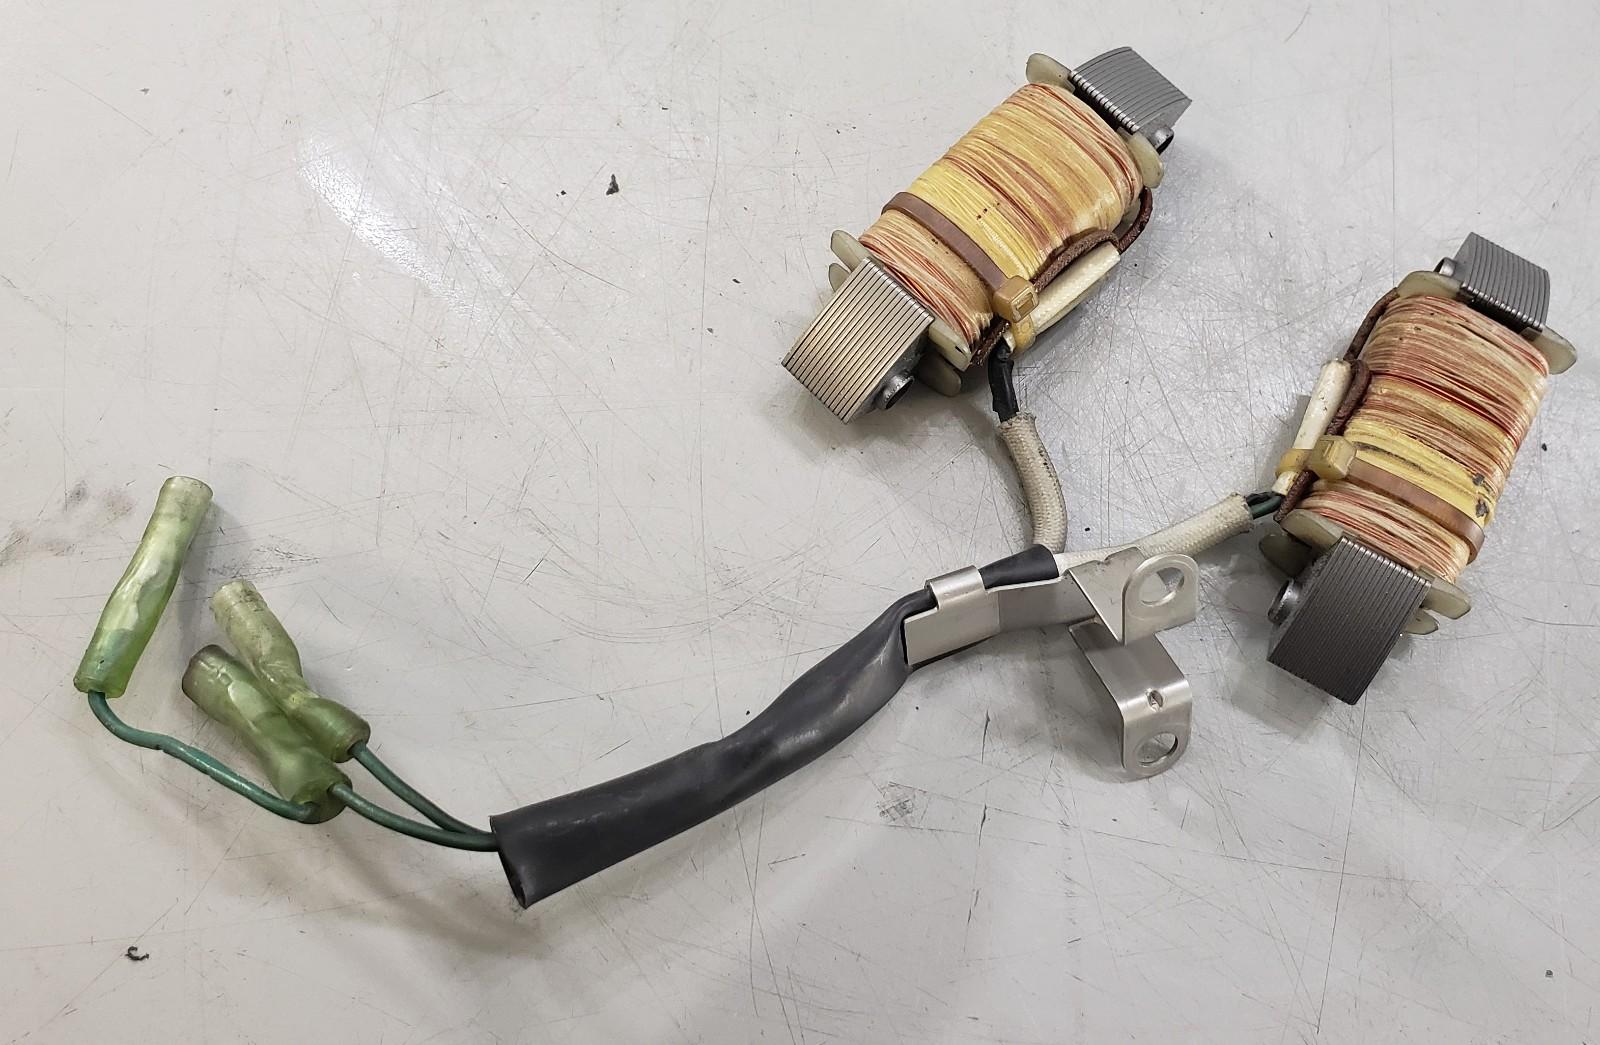 Zündspule Ignition coil Mercury Mercruiser 9.9 13.5 15 HP 855685T